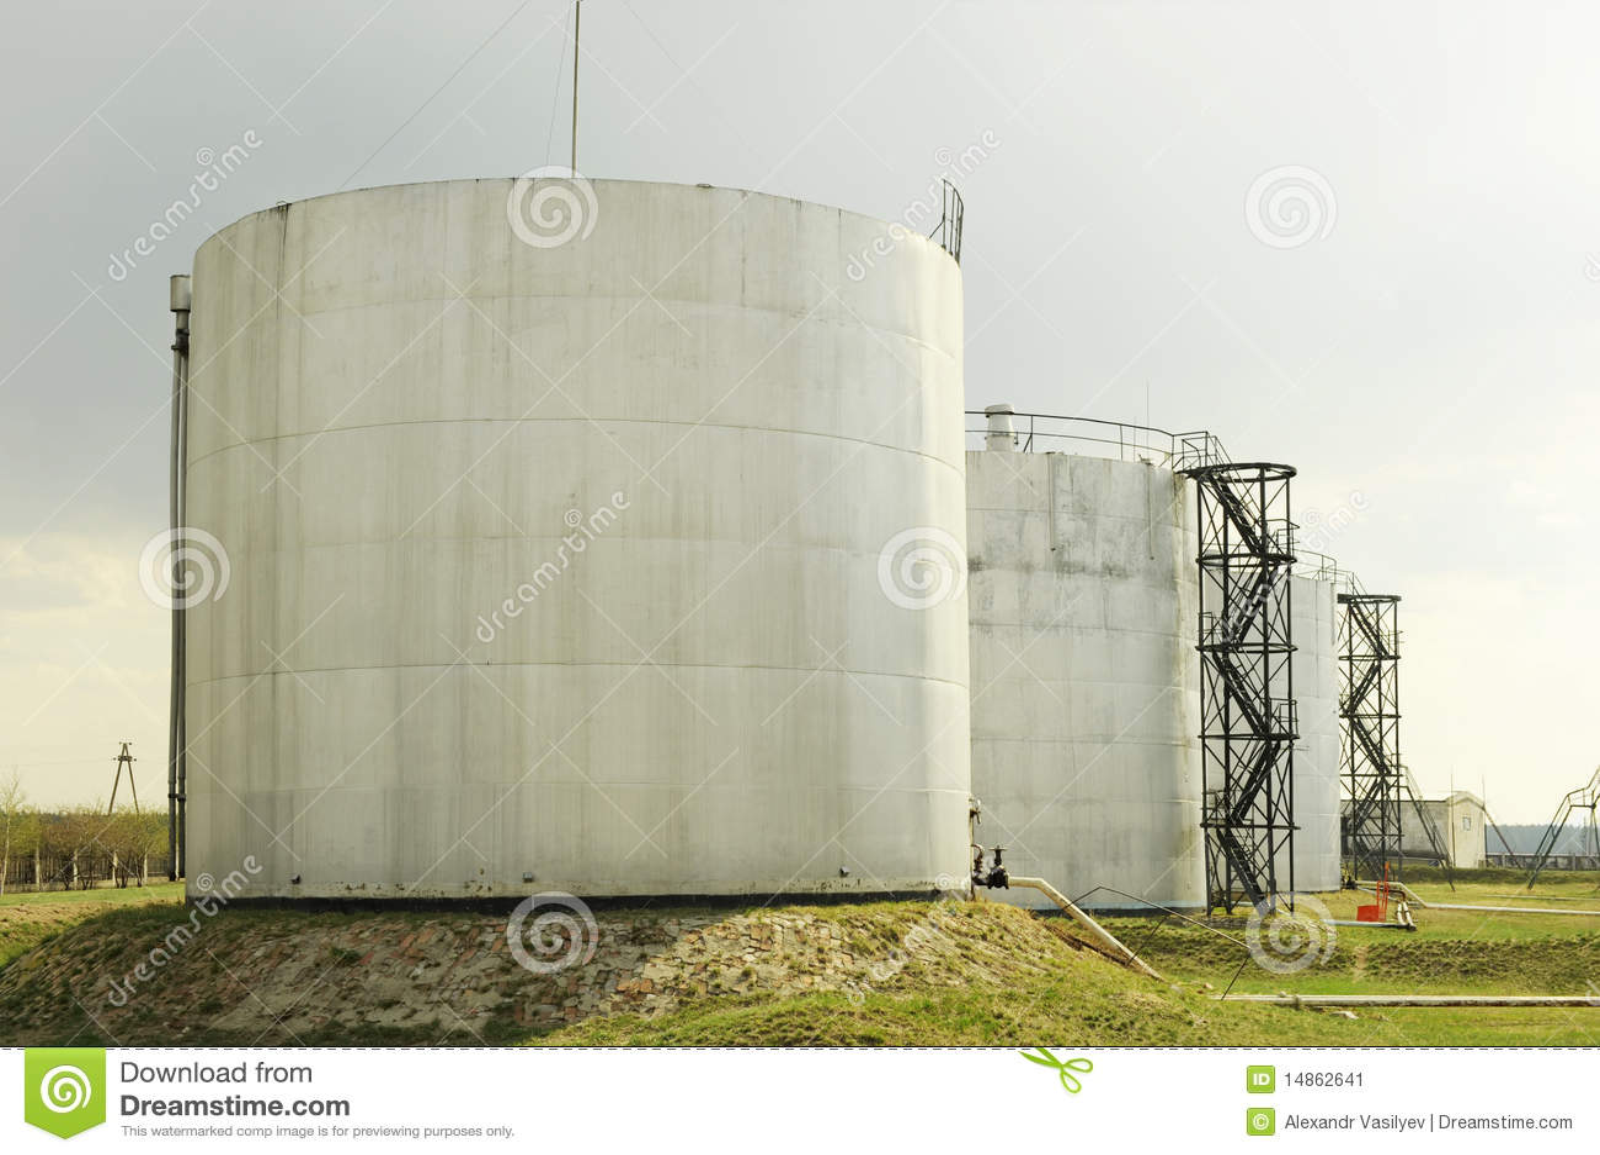 Petroleum storage depot